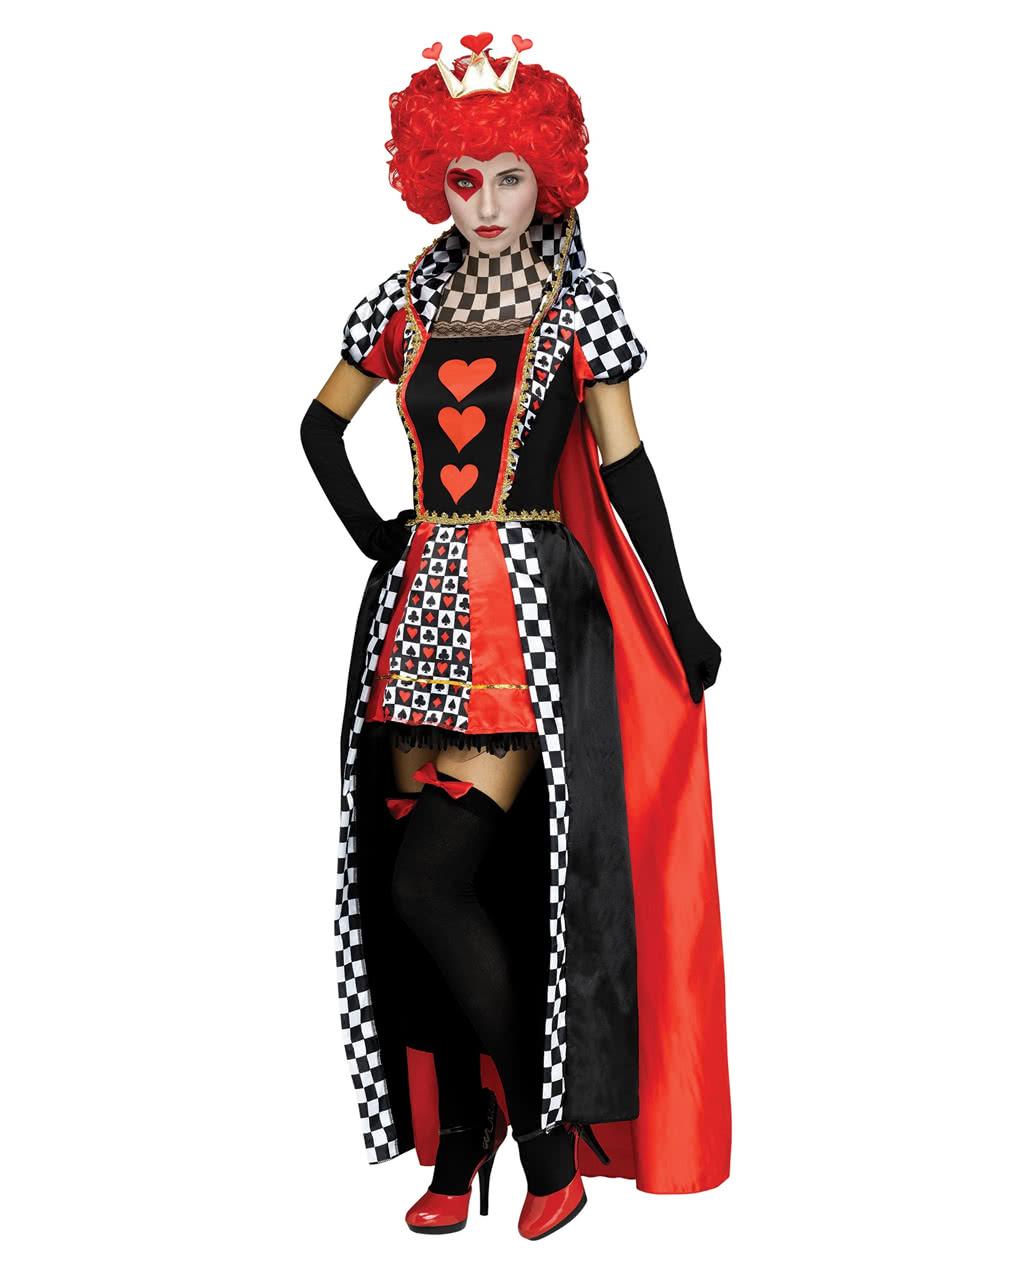 Herz Konigin Kostum Halloween Verkleidung Horror Shop Com